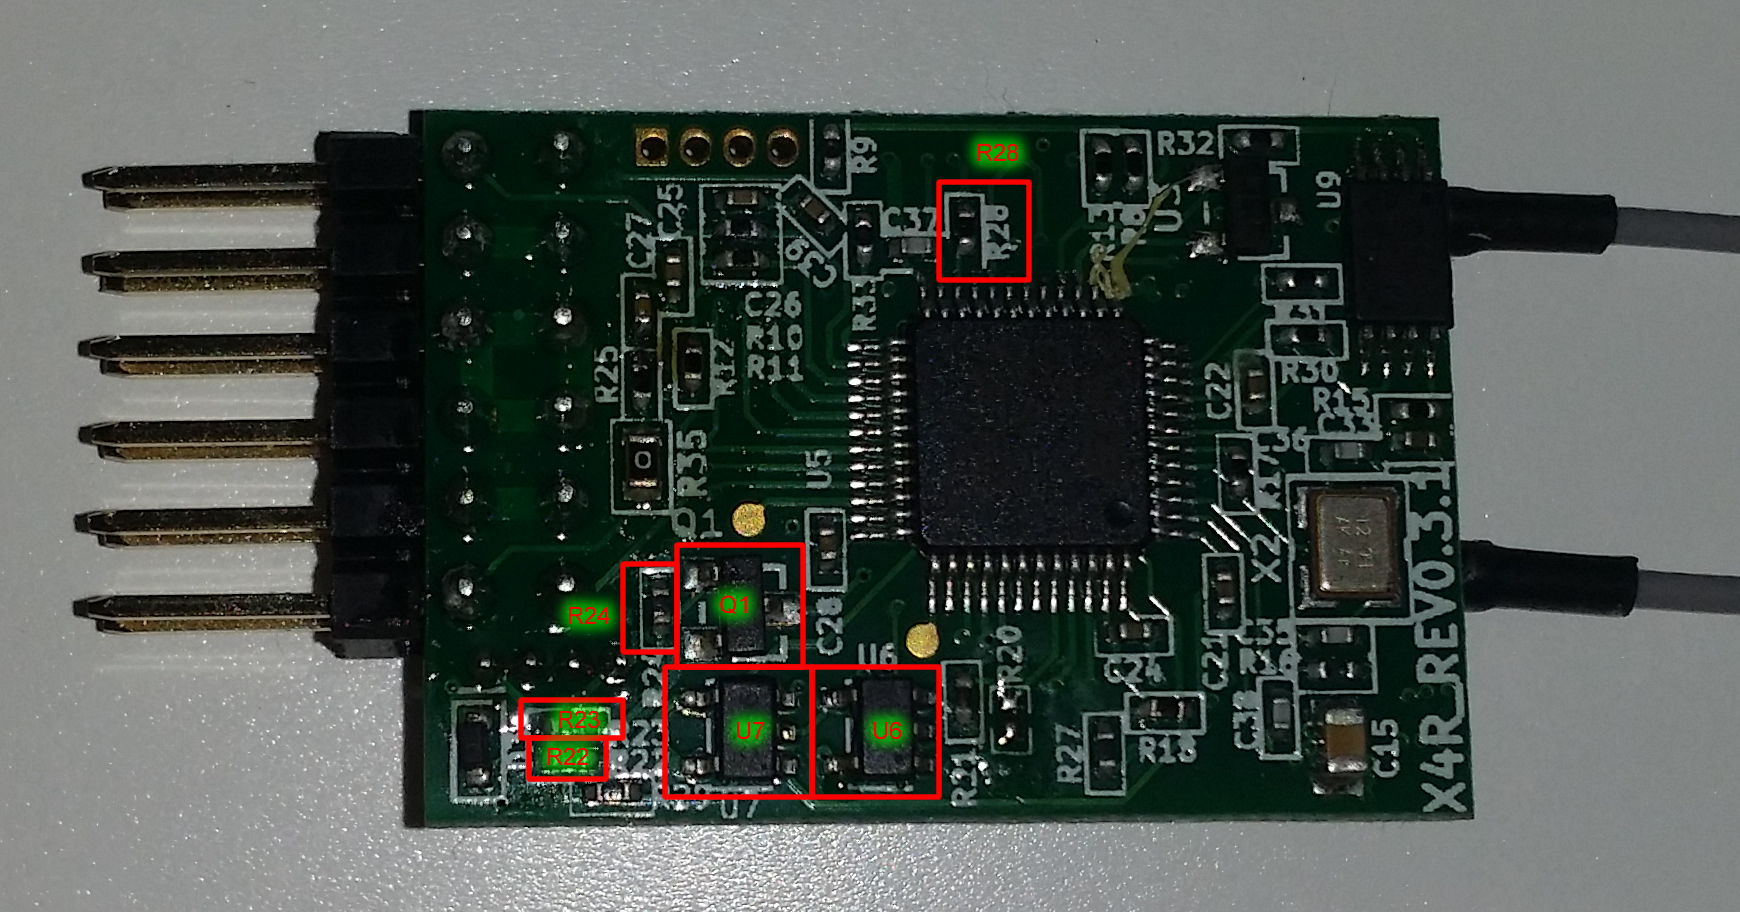 WRG-8579] Naze 32 D4r Ii Wiring Diagram on